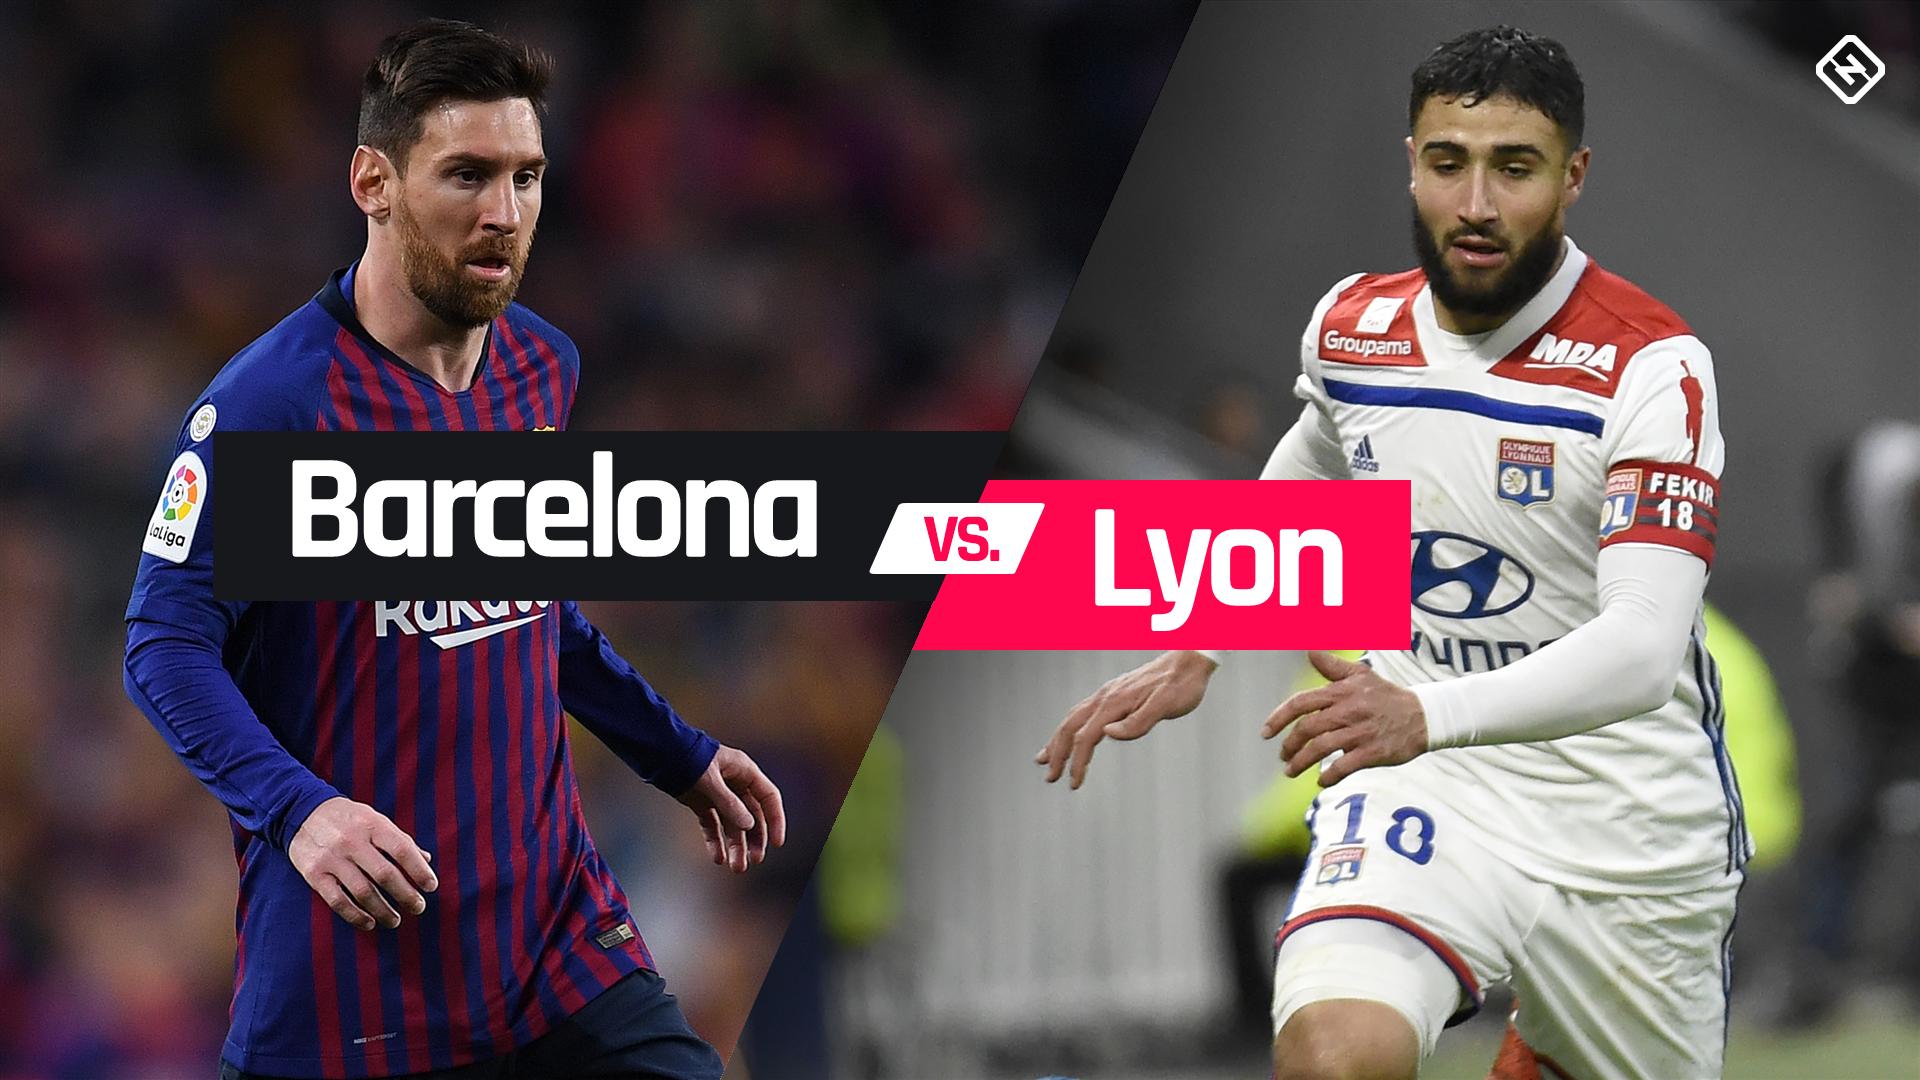 Barcelona Vs Lyon Champions League 2019 Photo: Sport (UK), Jürgen Klopp